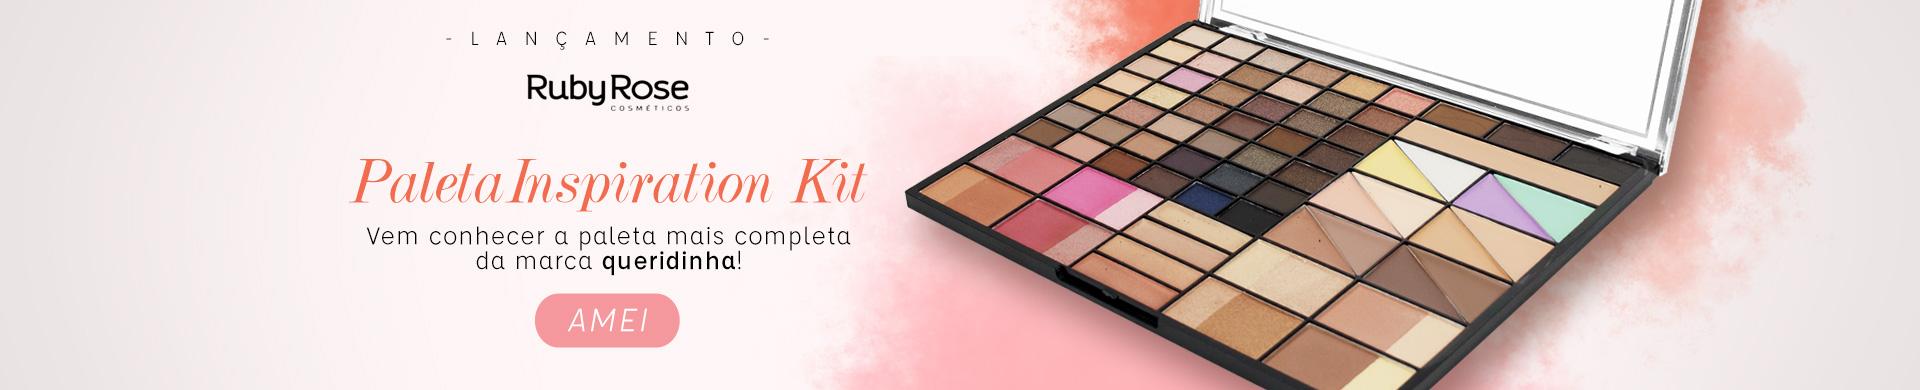 Paleta Inspiration Kit